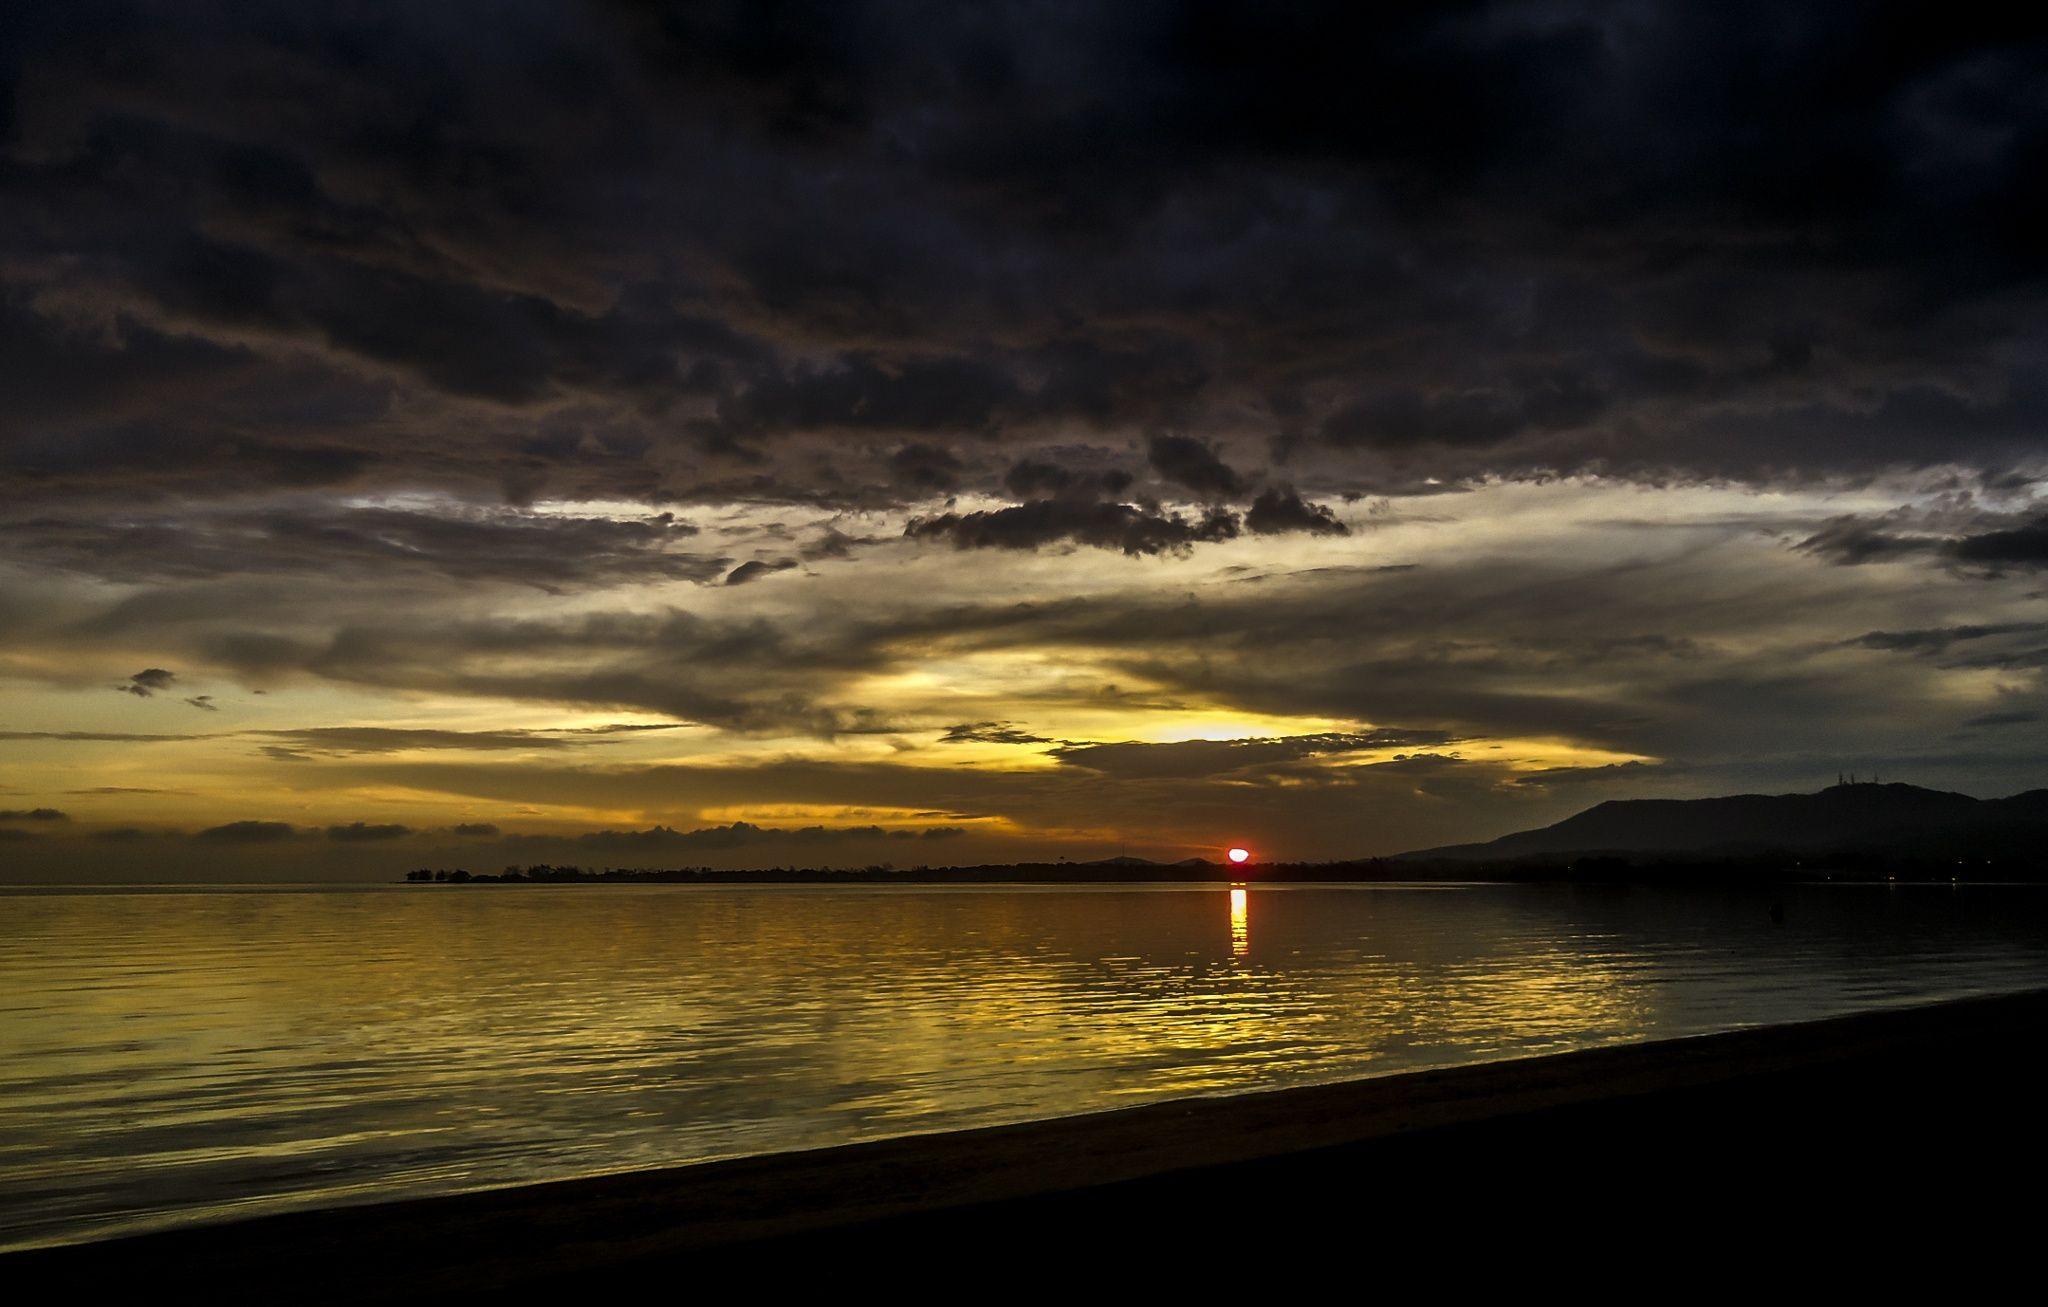 Sunset in boulevard by Digão Saldanha on 500px